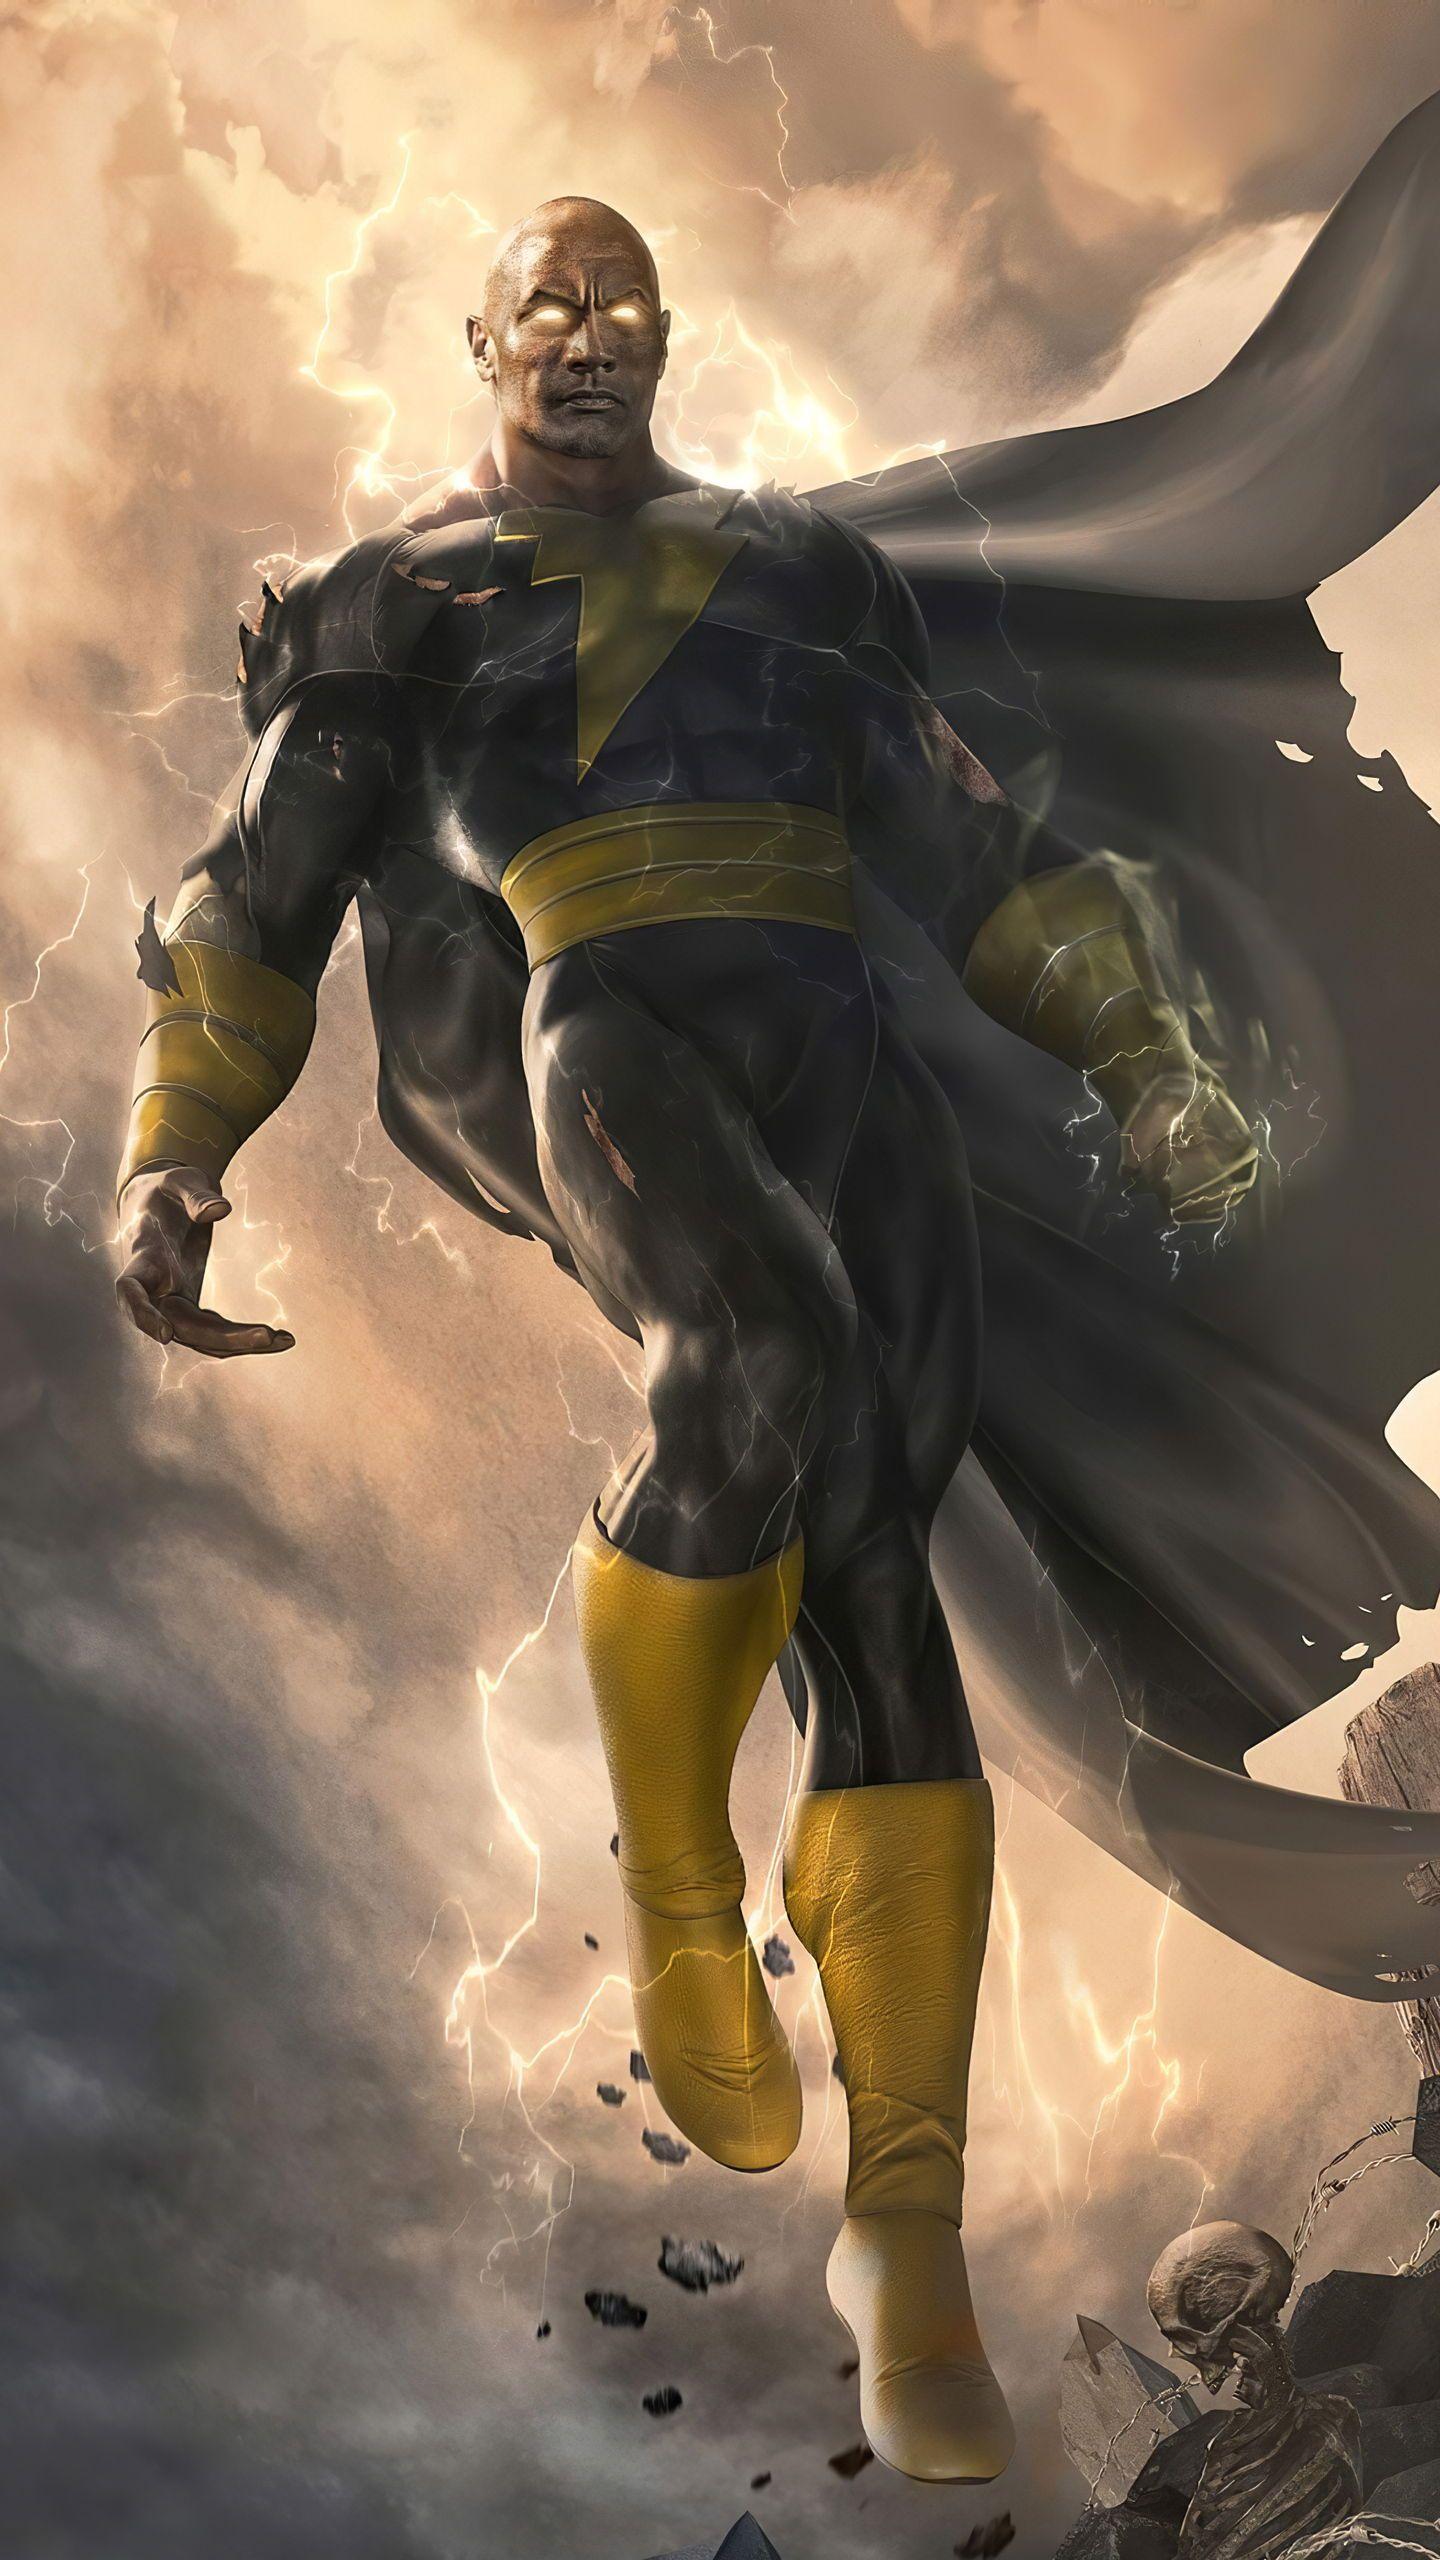 Download Movie Wallpapers | Superhero wallpaper, Glitch ...